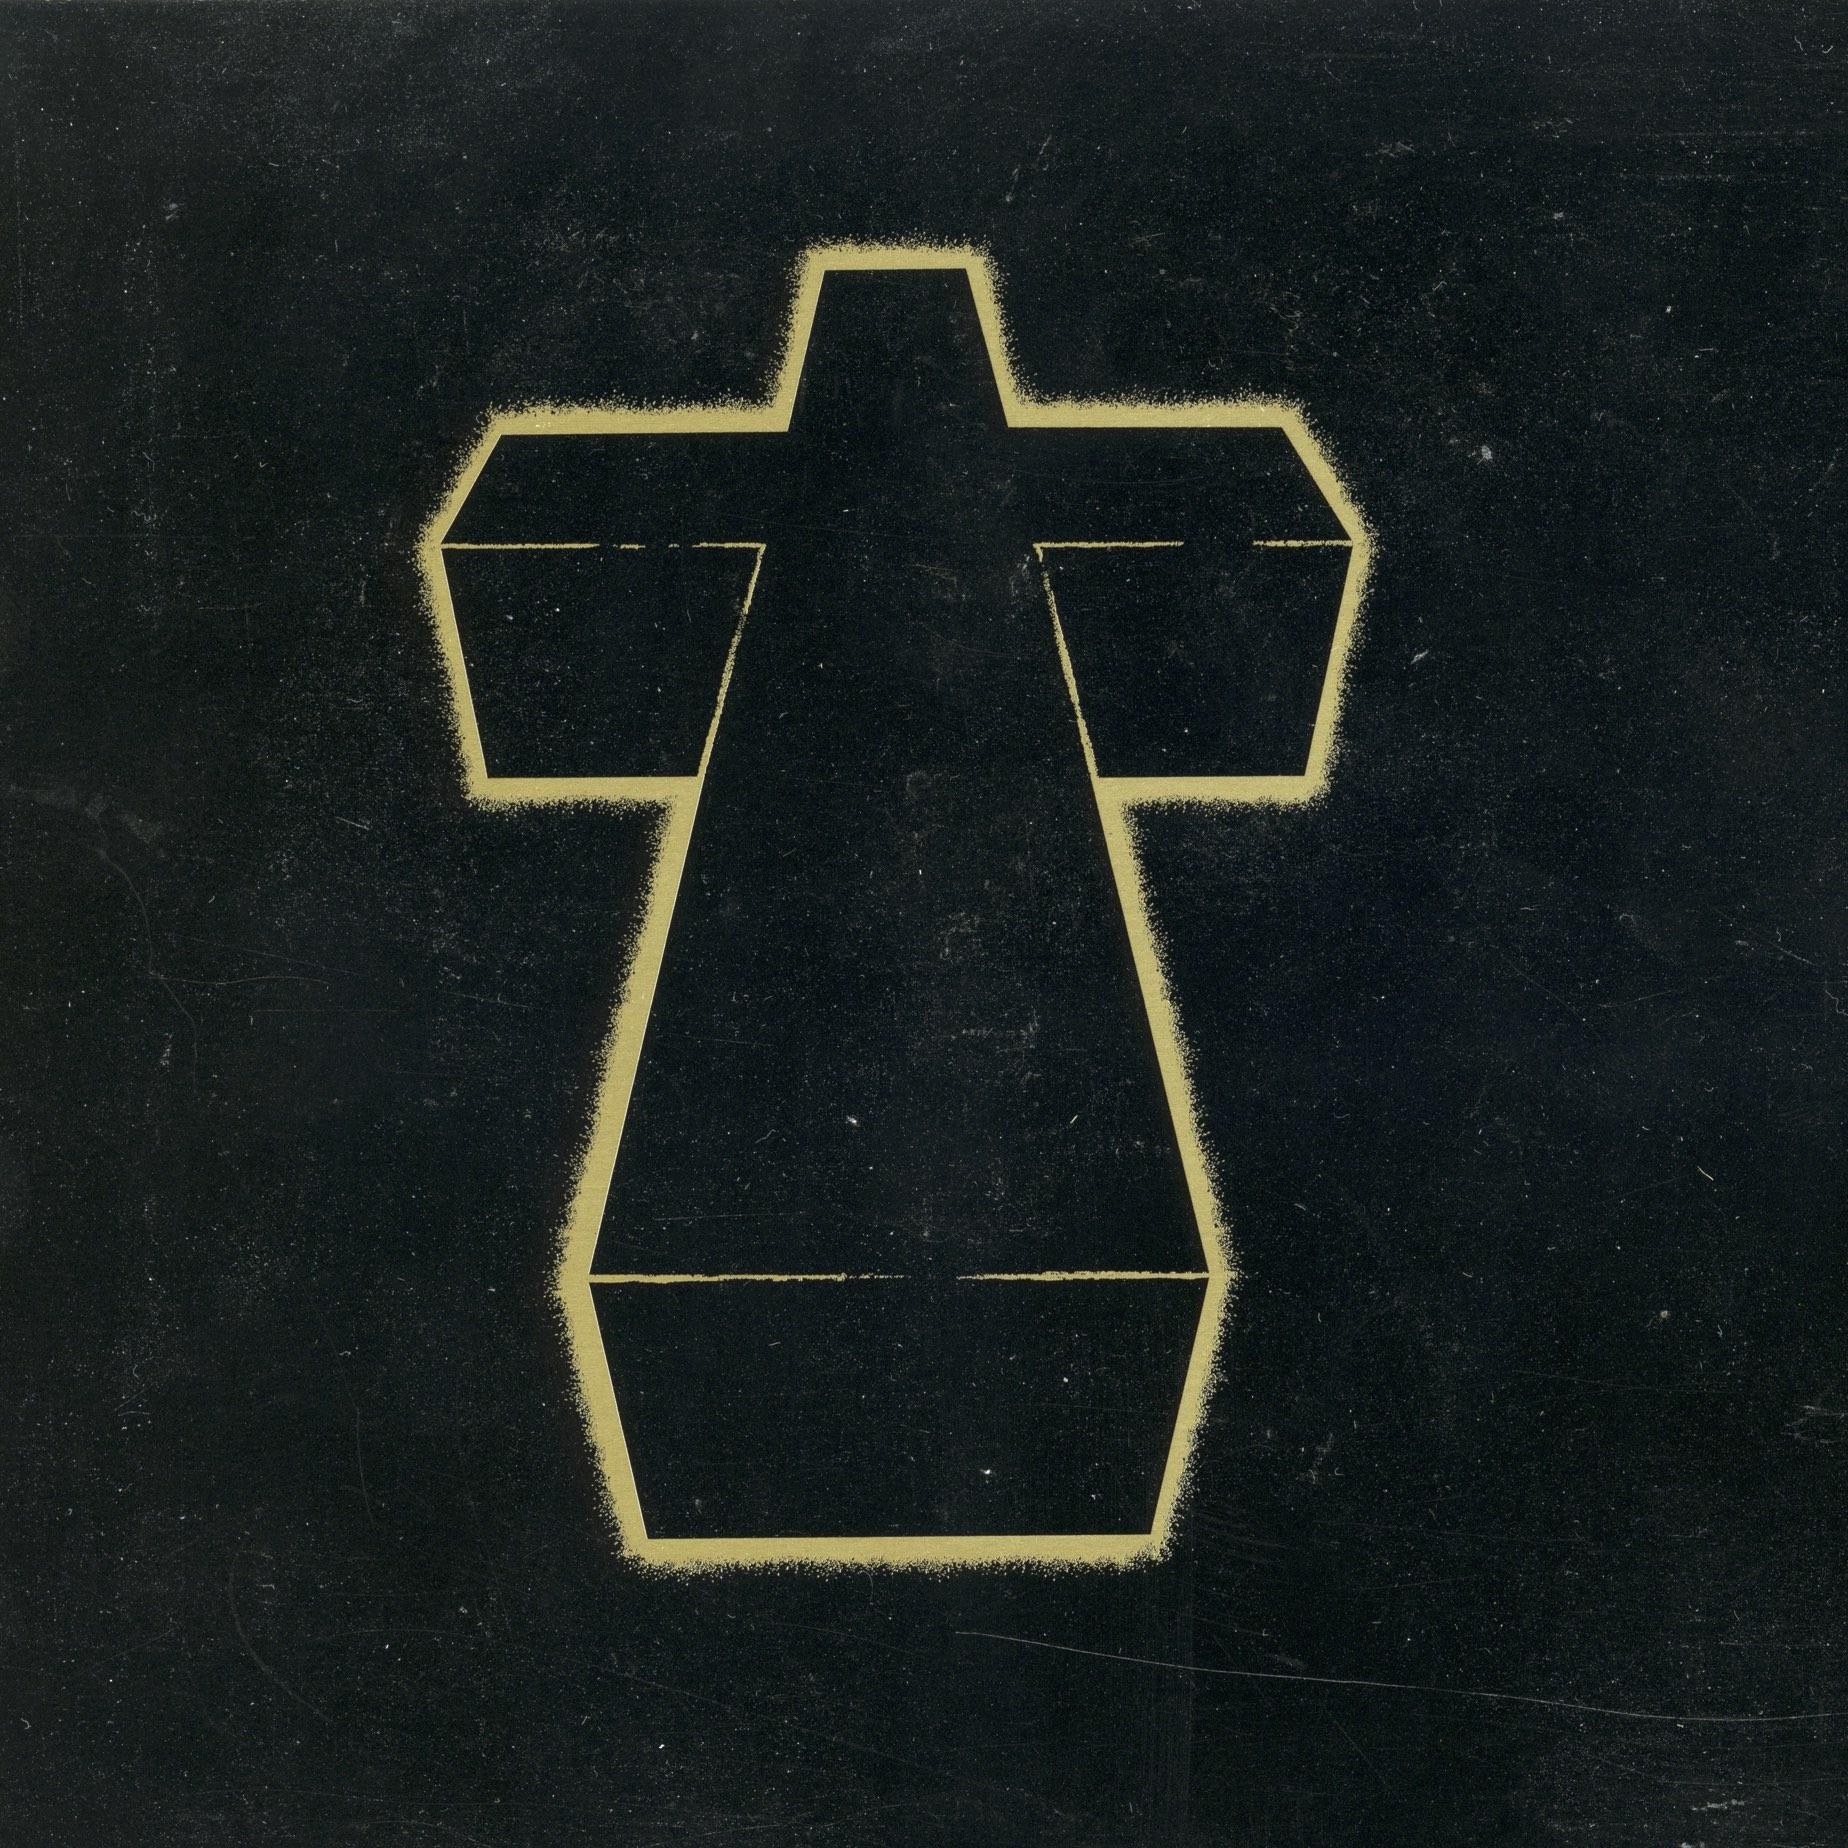 2006 - Justice